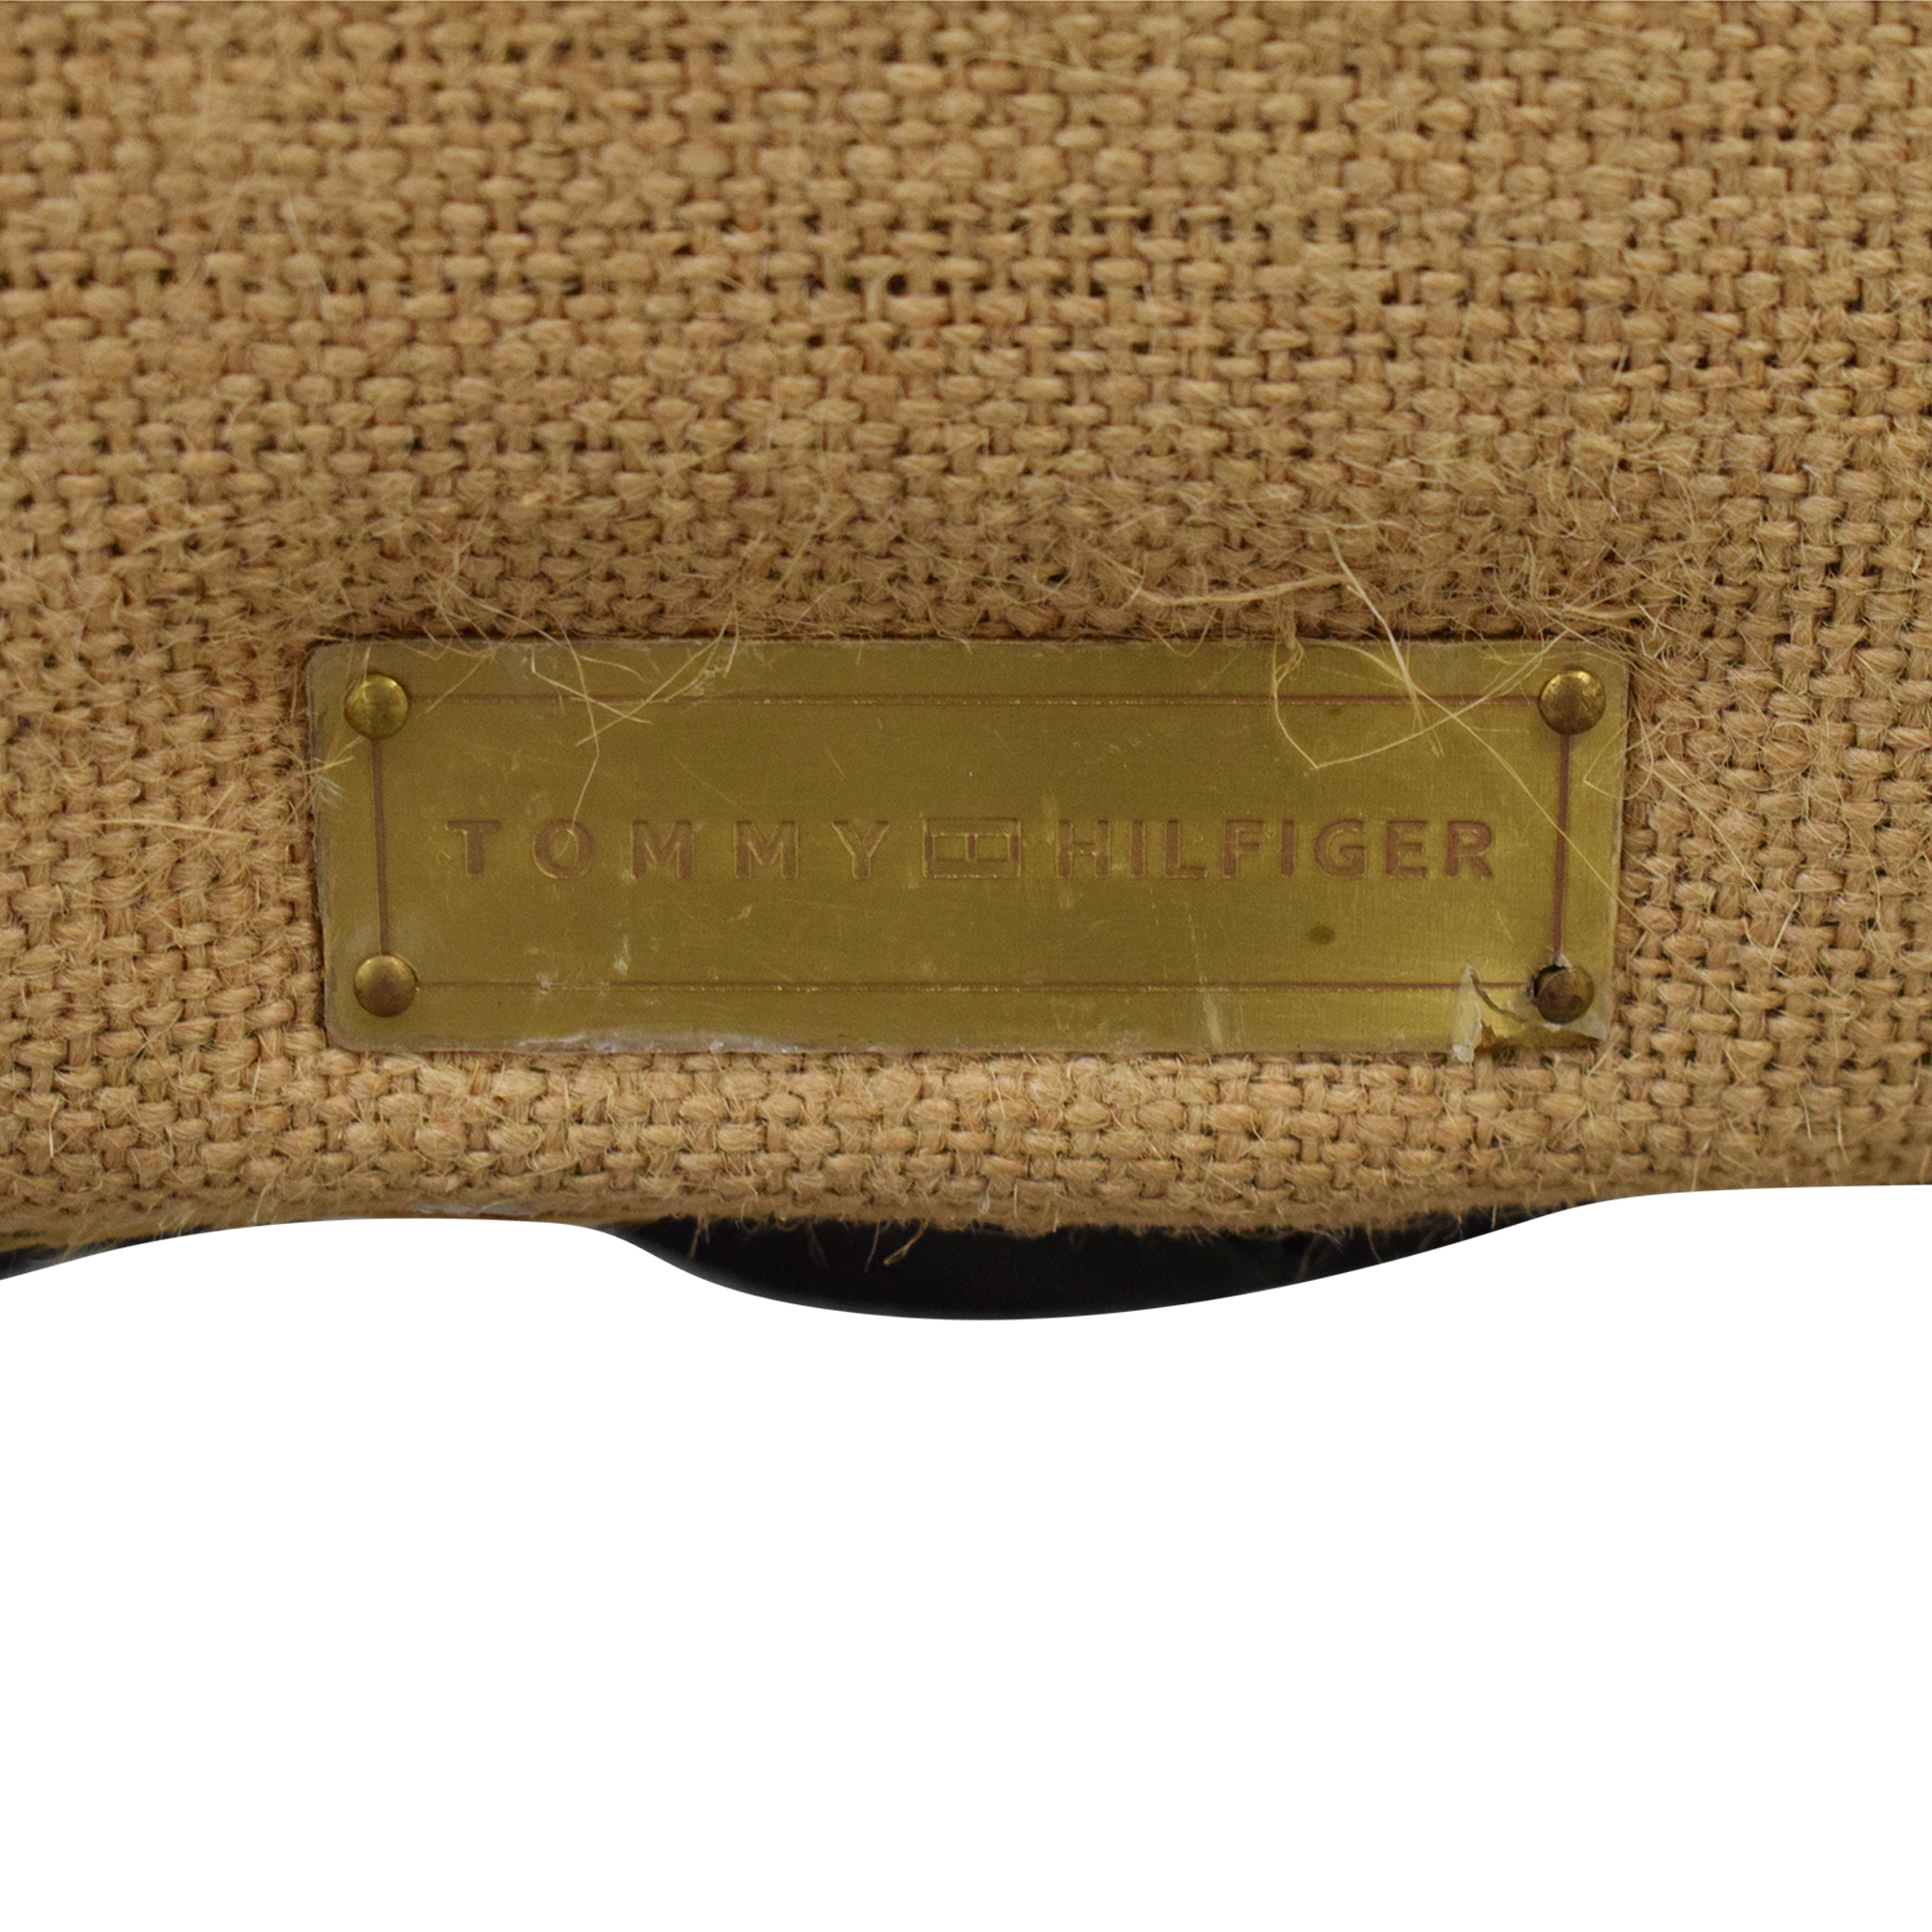 Bed Bath & Beyond Tommy Hilfiger Warner Wingback Chair tan & grey